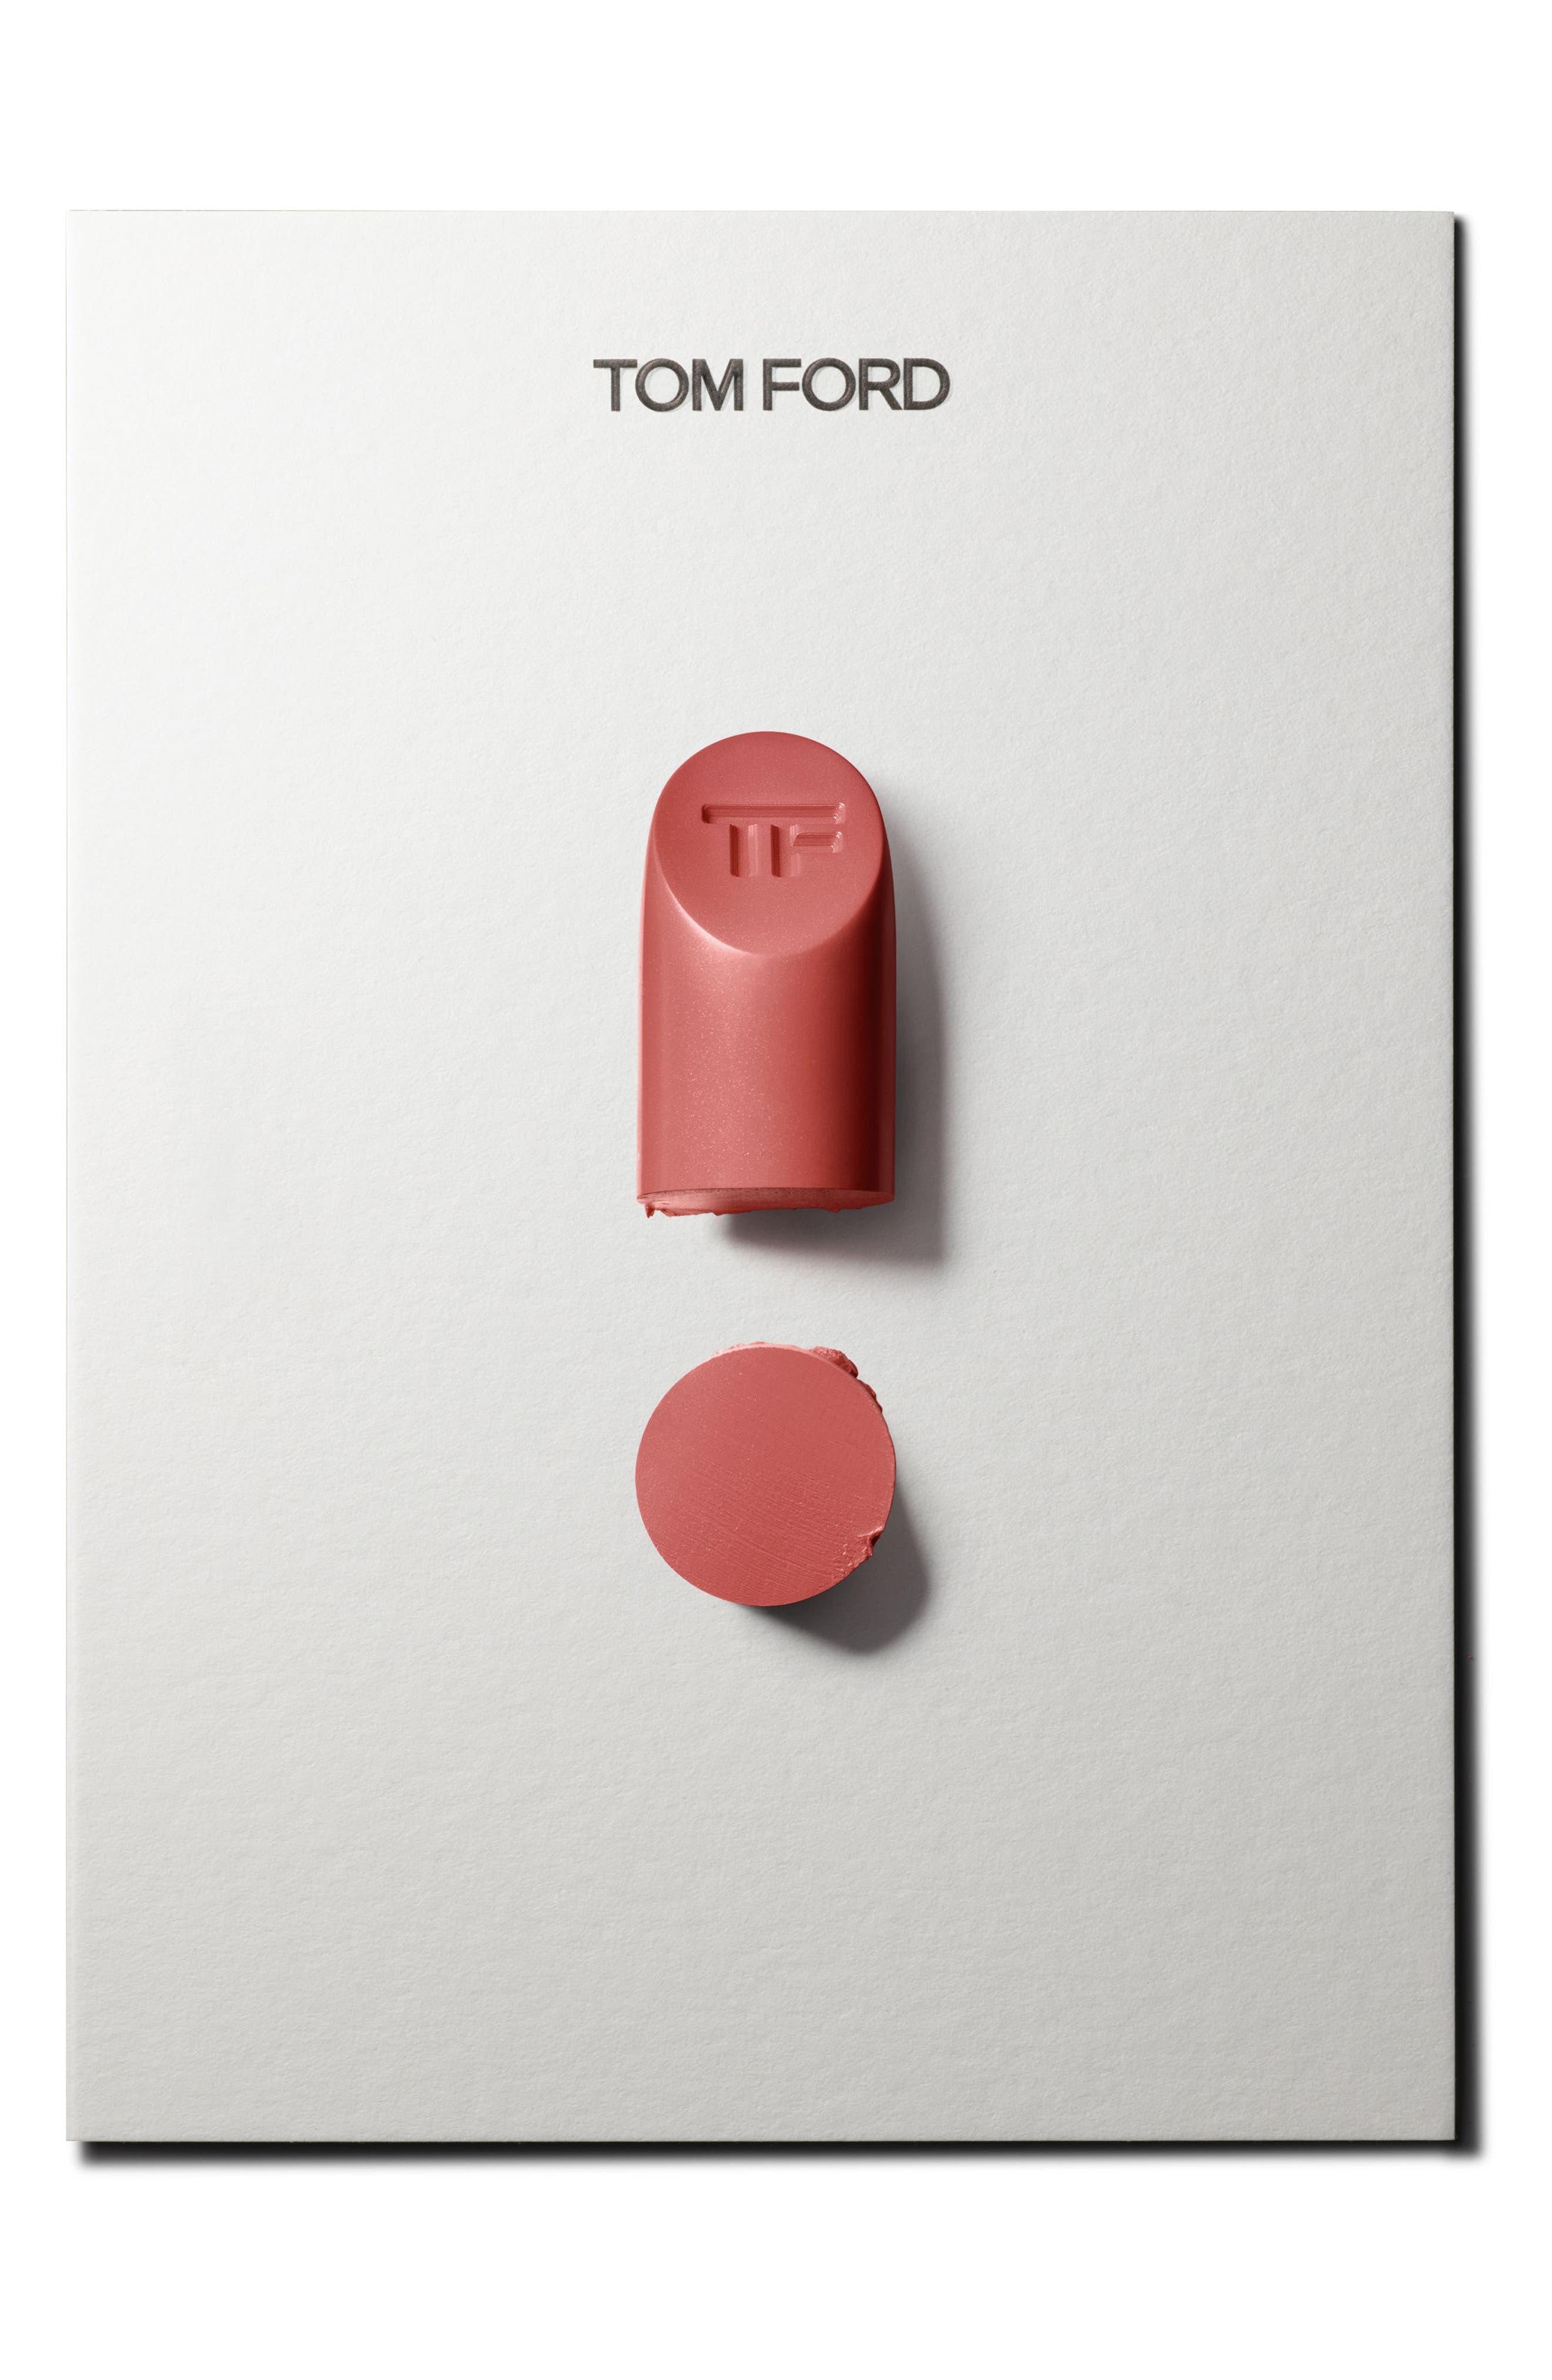 TOM FORD, Boys & Girls Lip Color - The Boys, Alternate thumbnail 4, color, JAMES/ CREAM